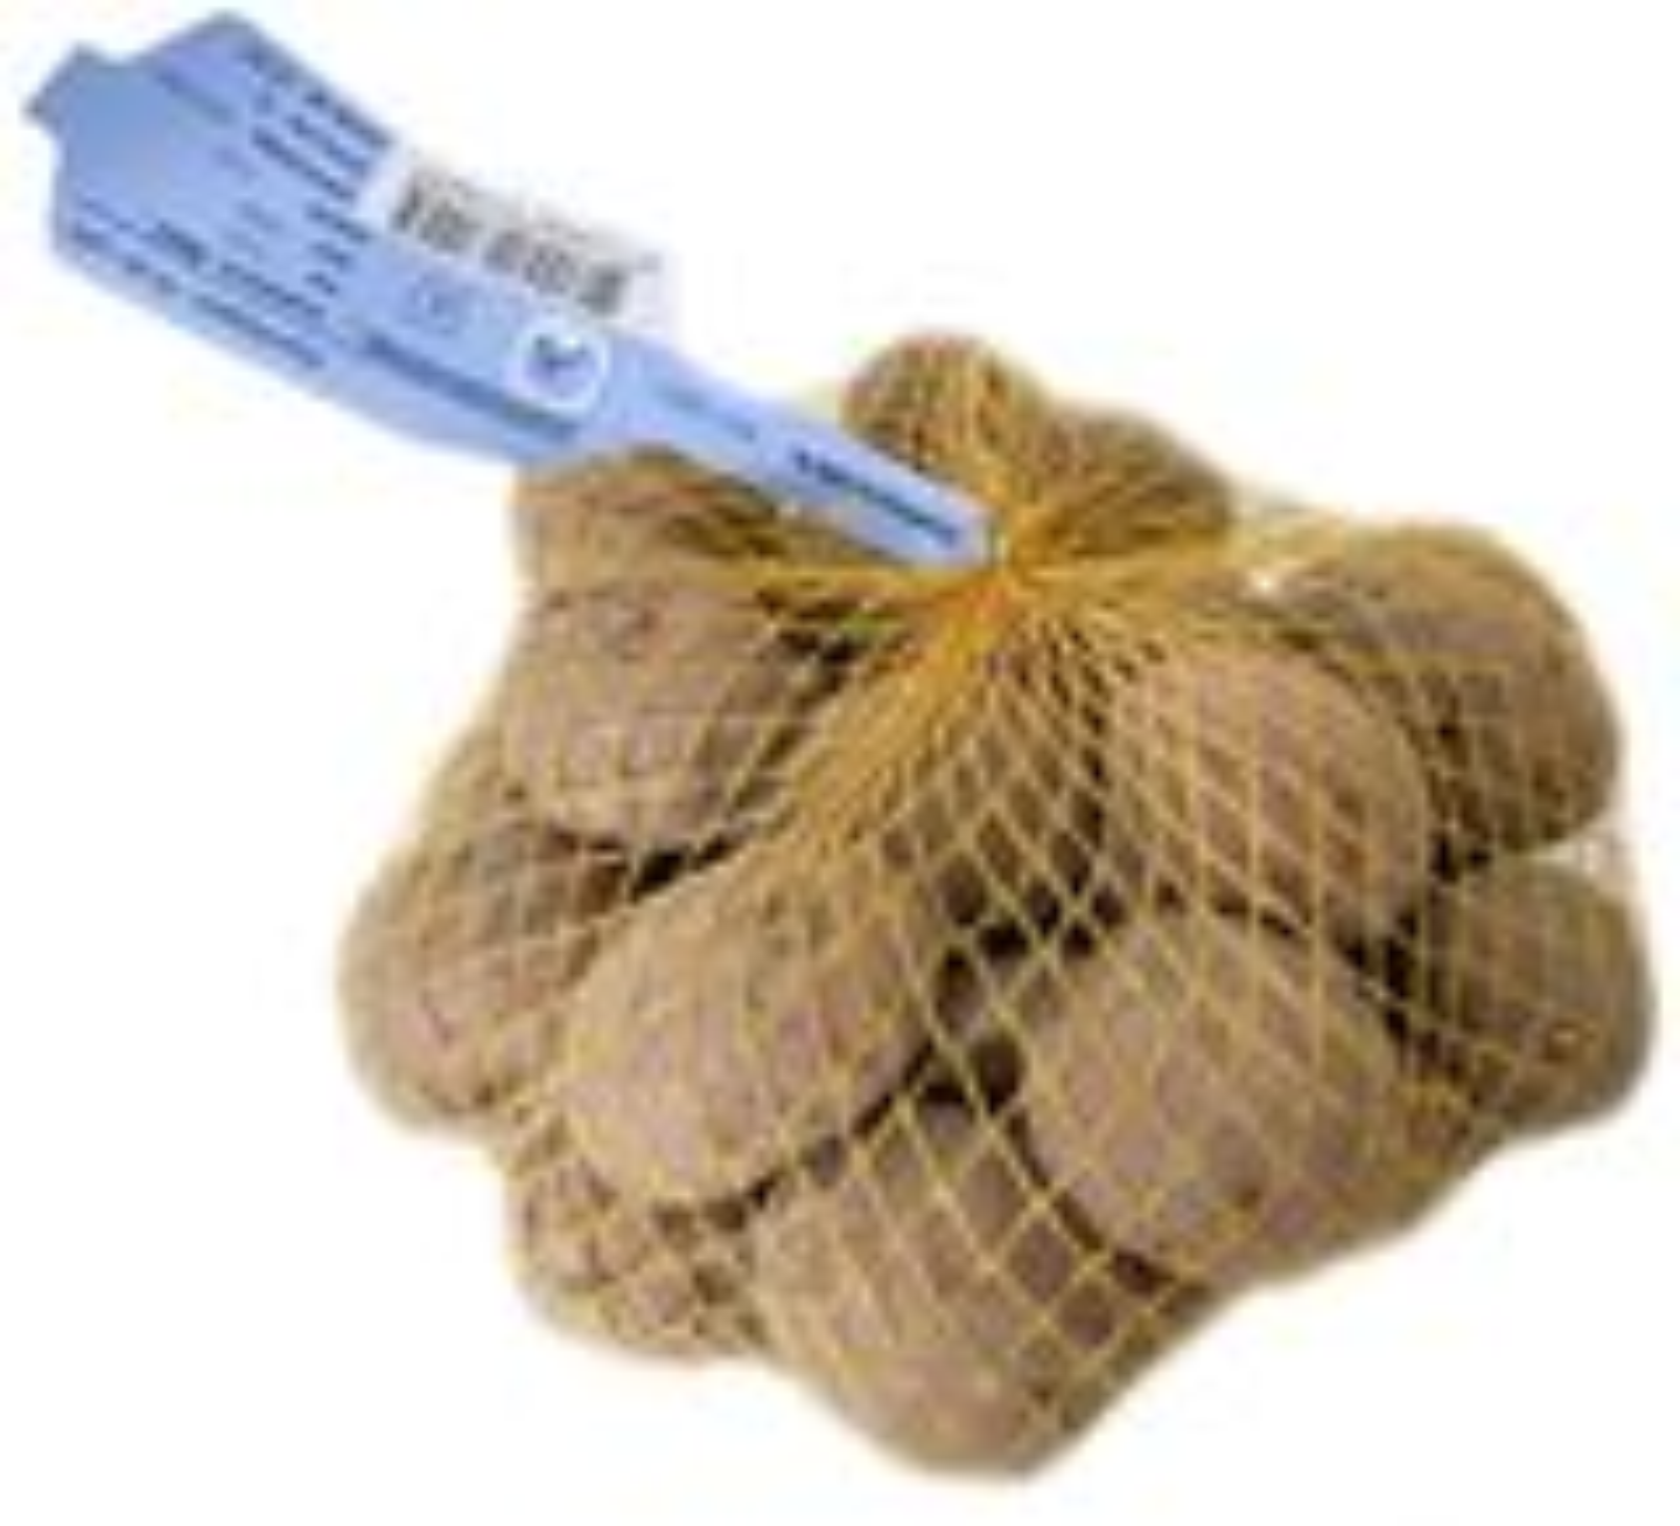 Pootaardappel Texla zakje 1kg - plaagresistent ECO